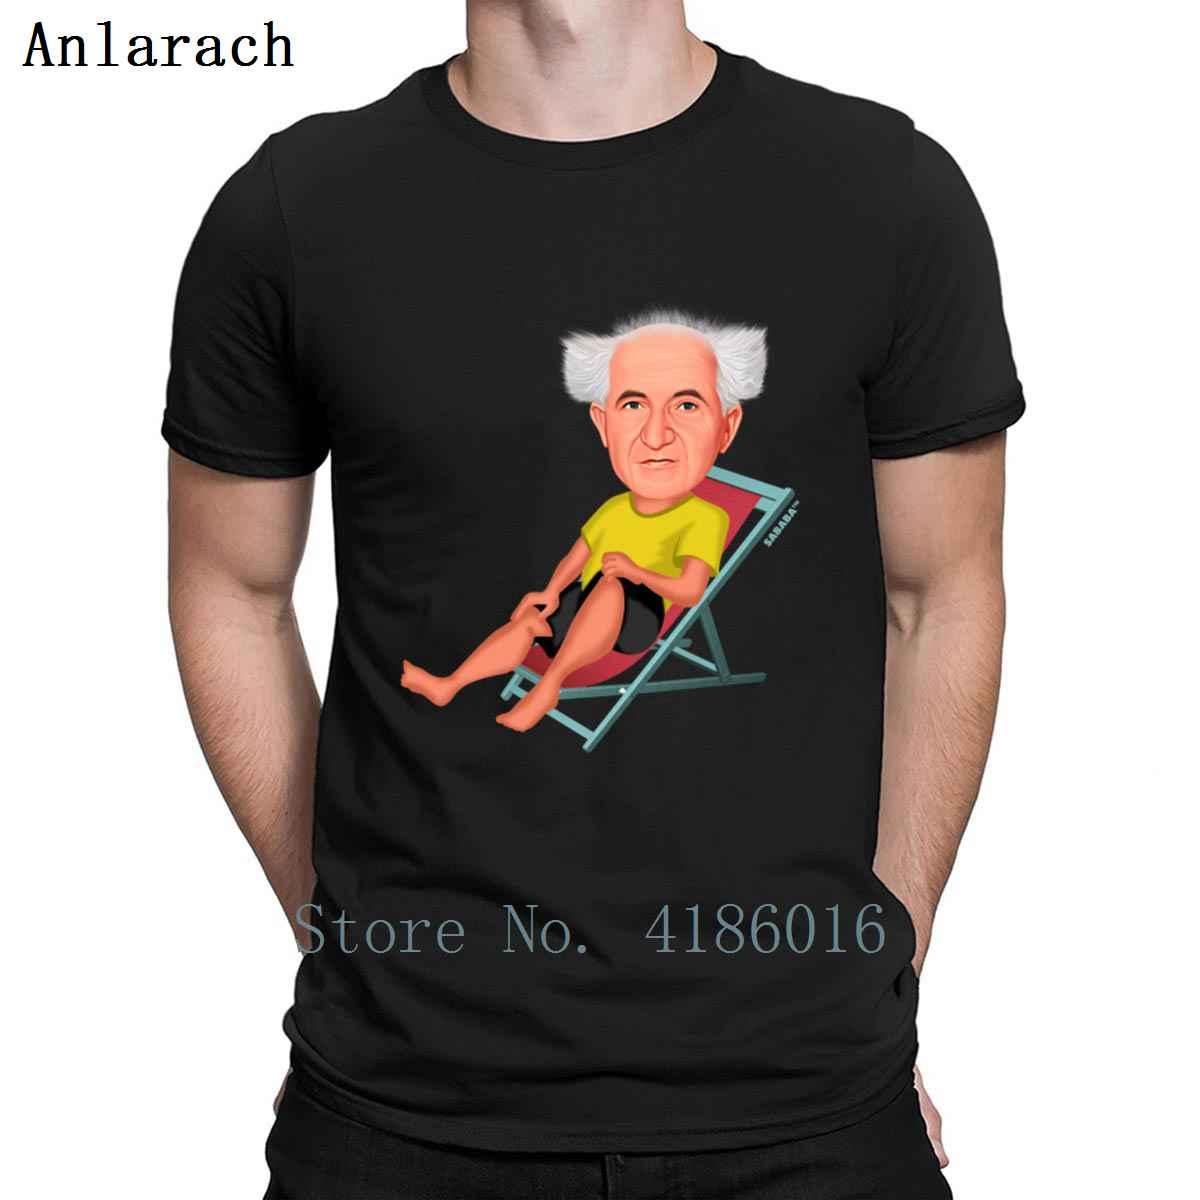 David Ben Gurion Israel First Prime Minister T Shirt Sunlight Cool Funny Casual Euro Size S-5xl Normal Designing Tee Shirt Shirt